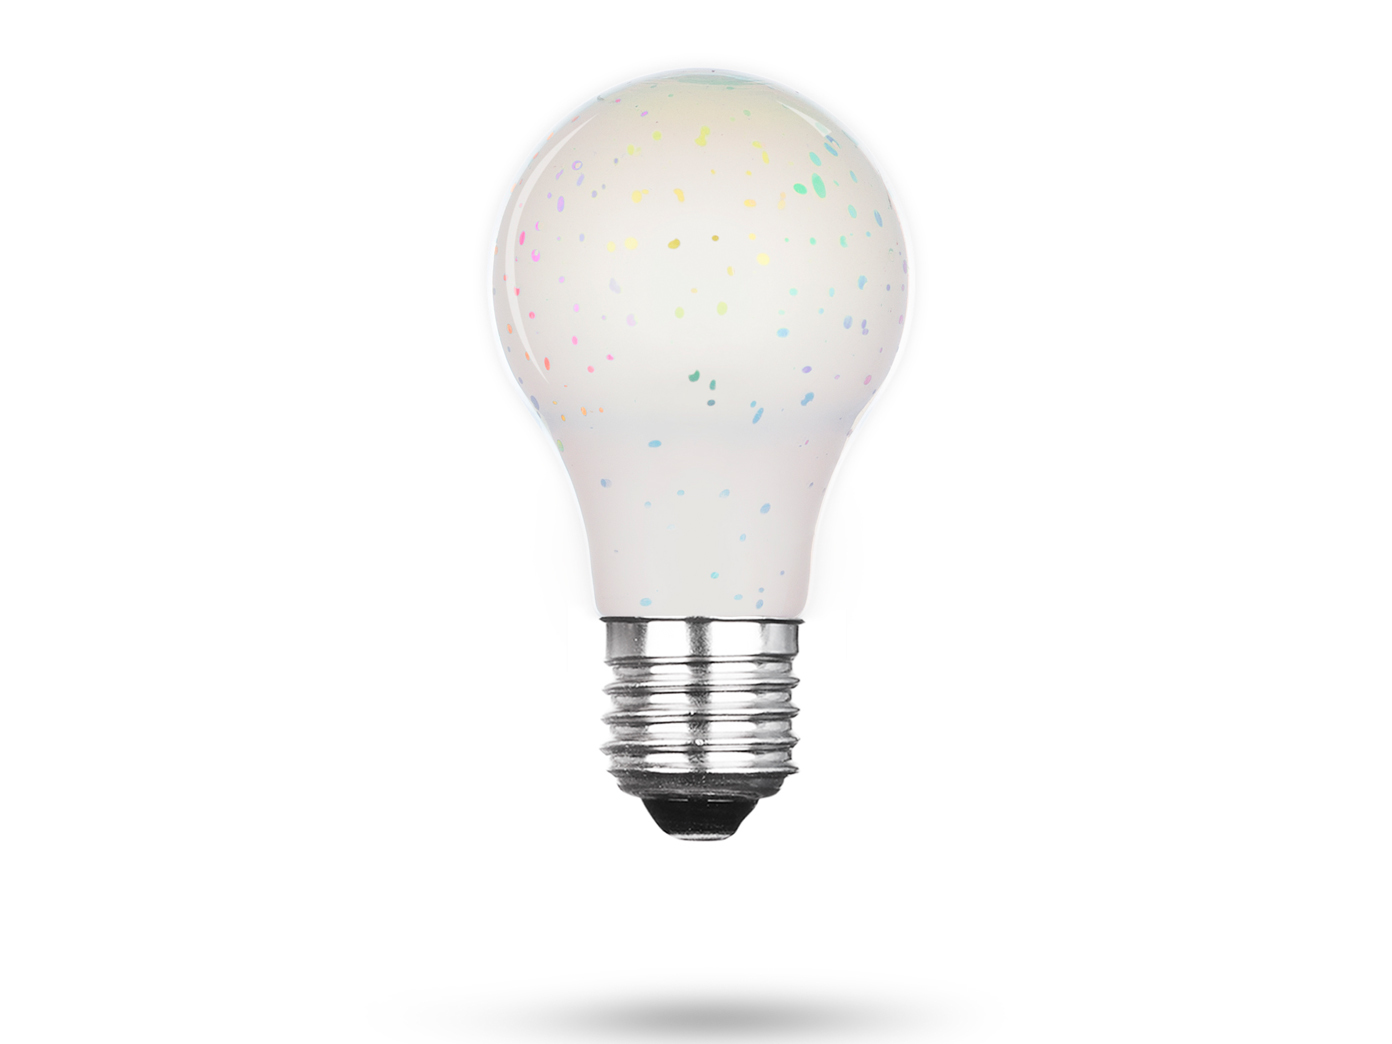 led deko leuchtmittel birne e27 stimmungsleuchtmittel 3d effekt partylicht eur 6 49. Black Bedroom Furniture Sets. Home Design Ideas